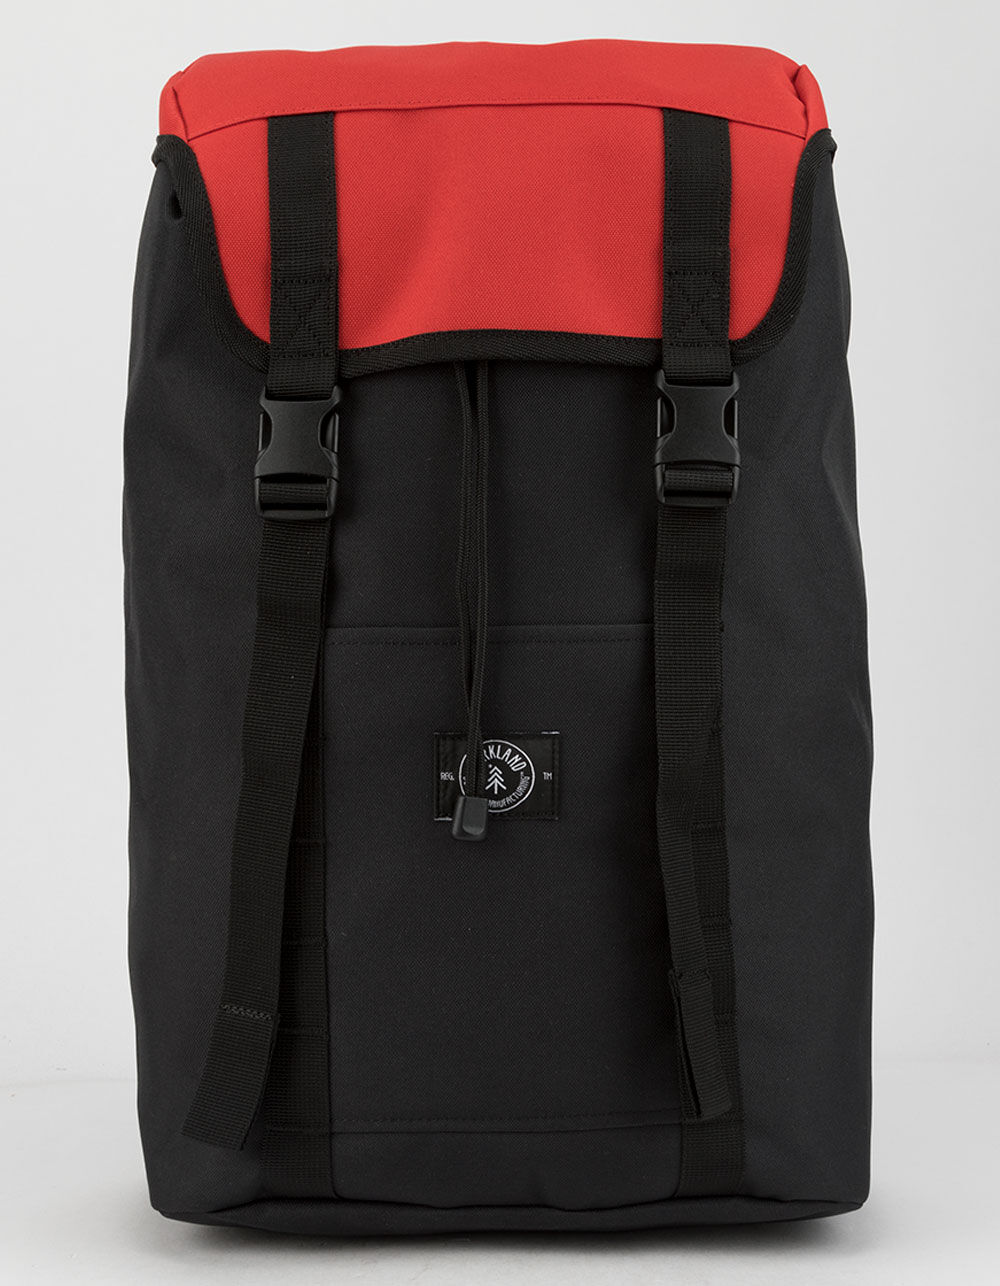 PARKLAND Westport Volcano Backpack